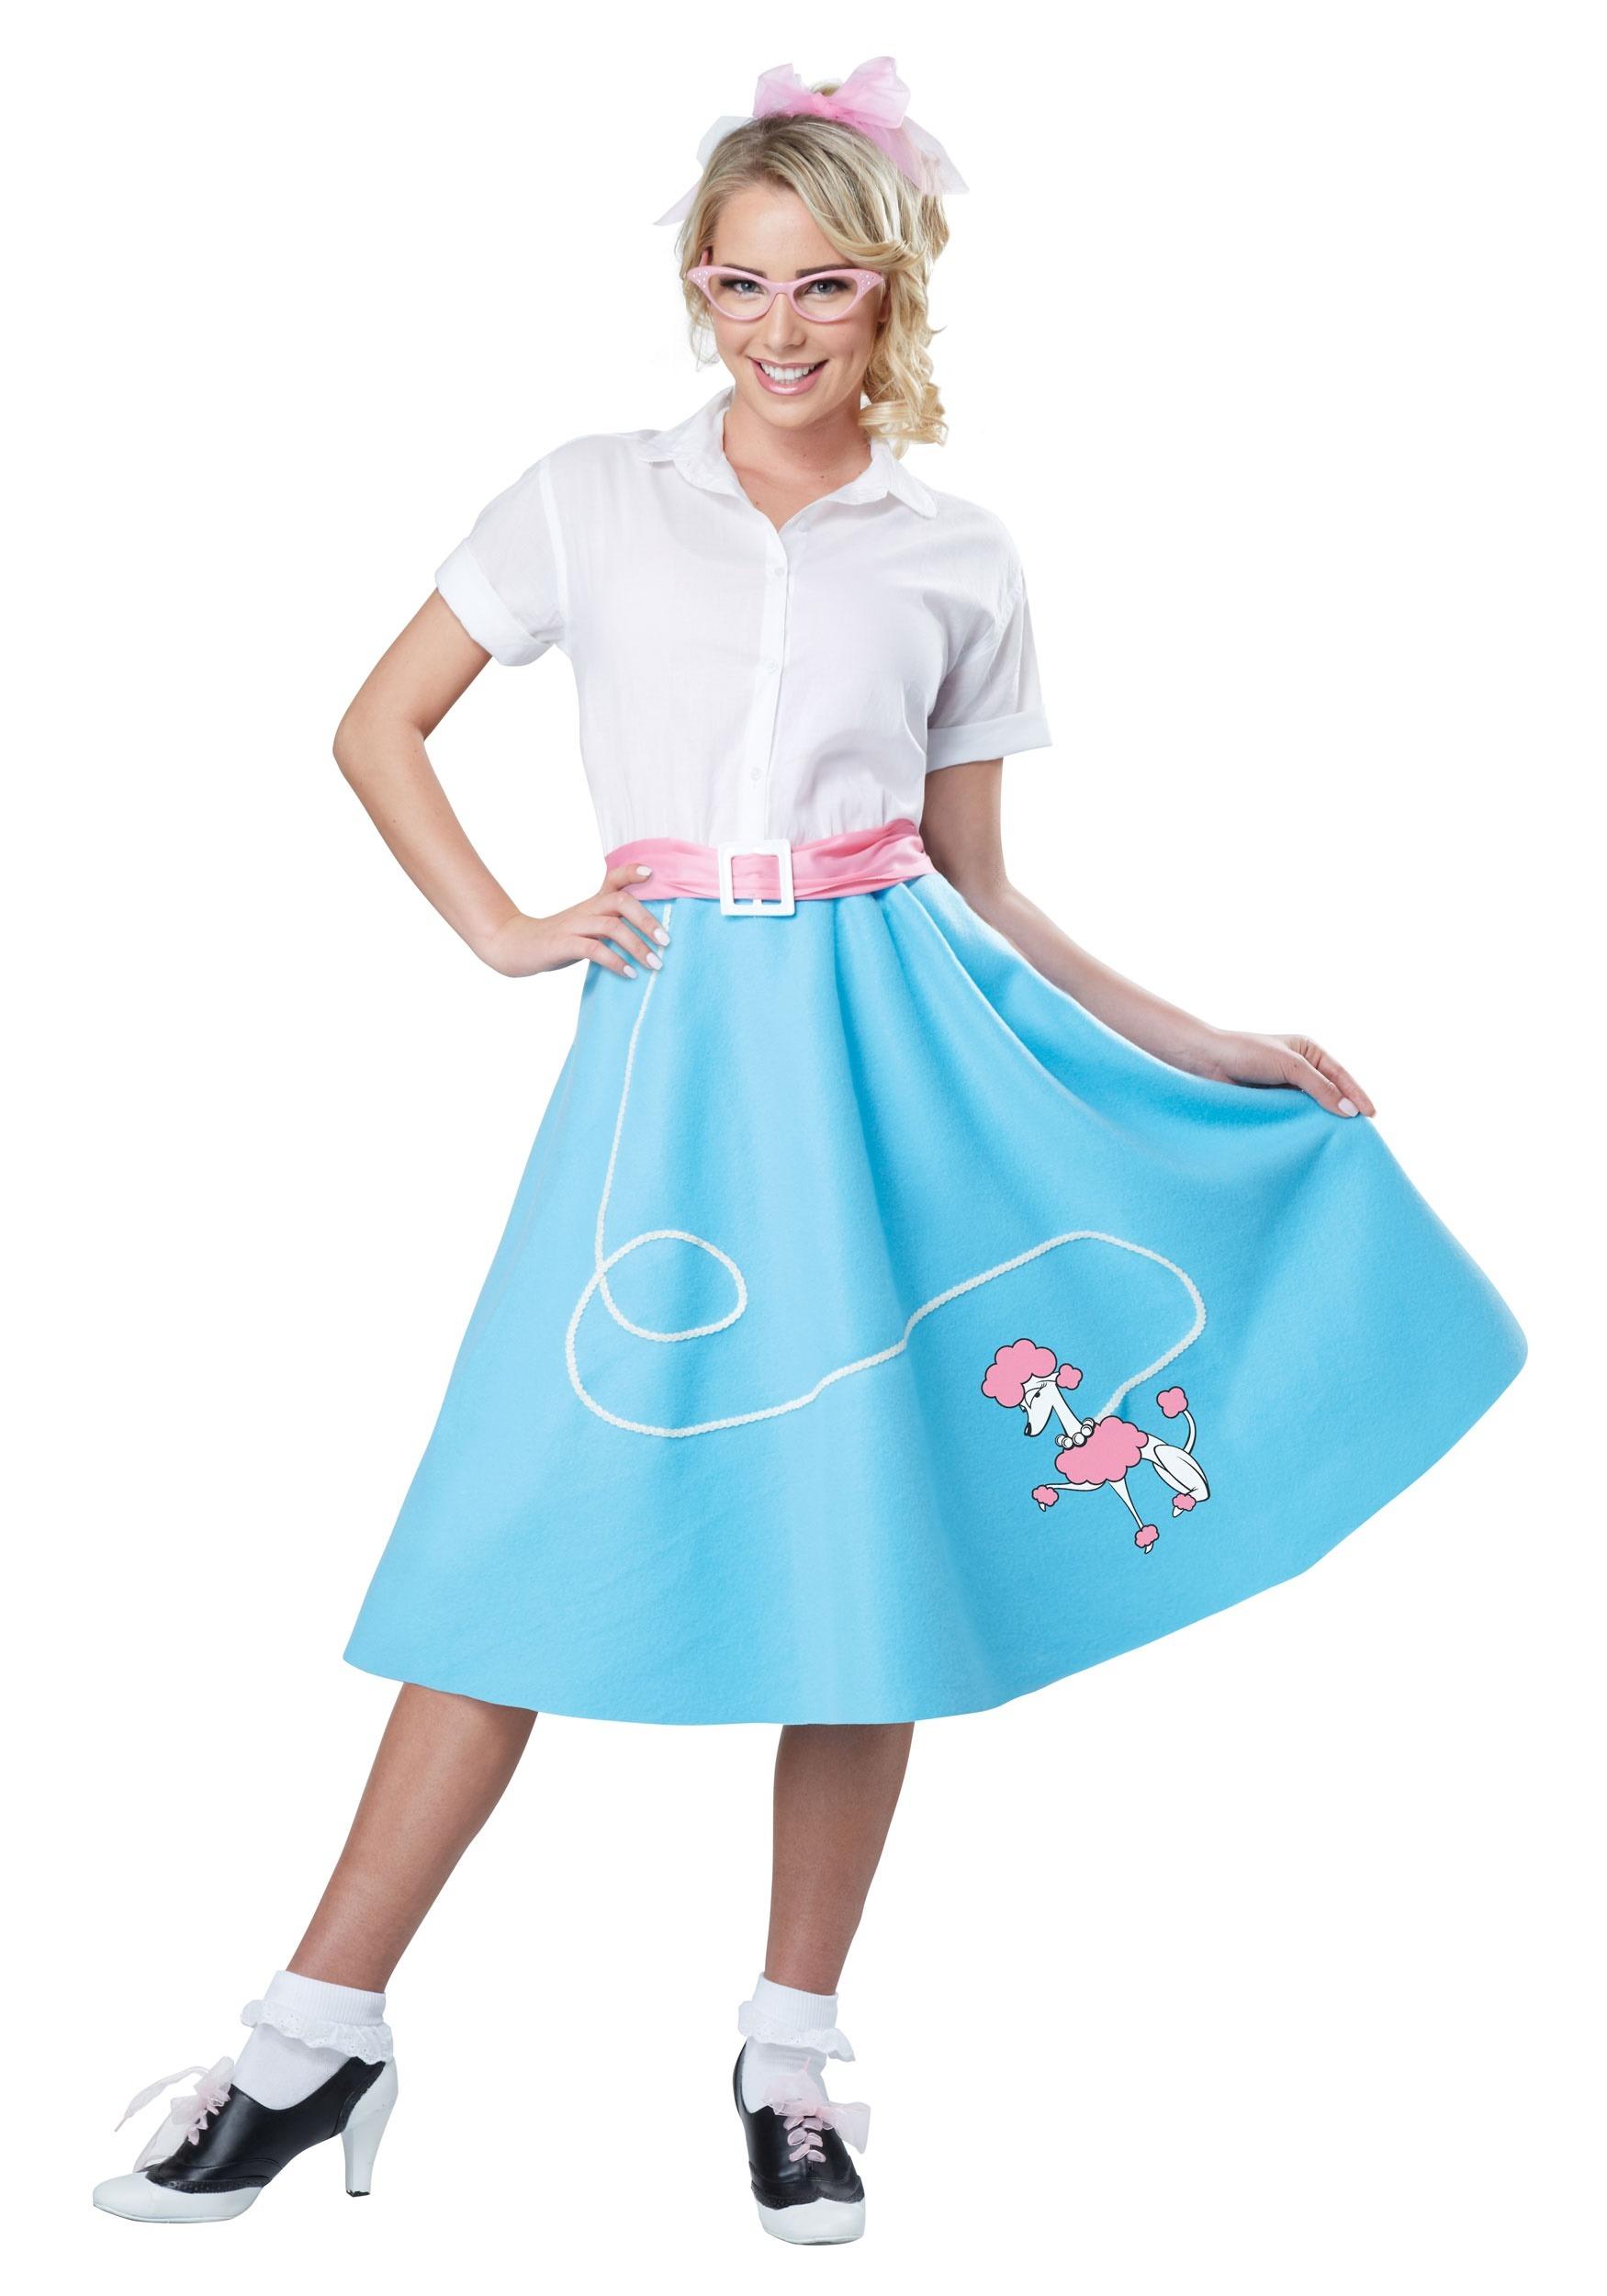 1950's Women's Plus Size Poodle Skirt Costume